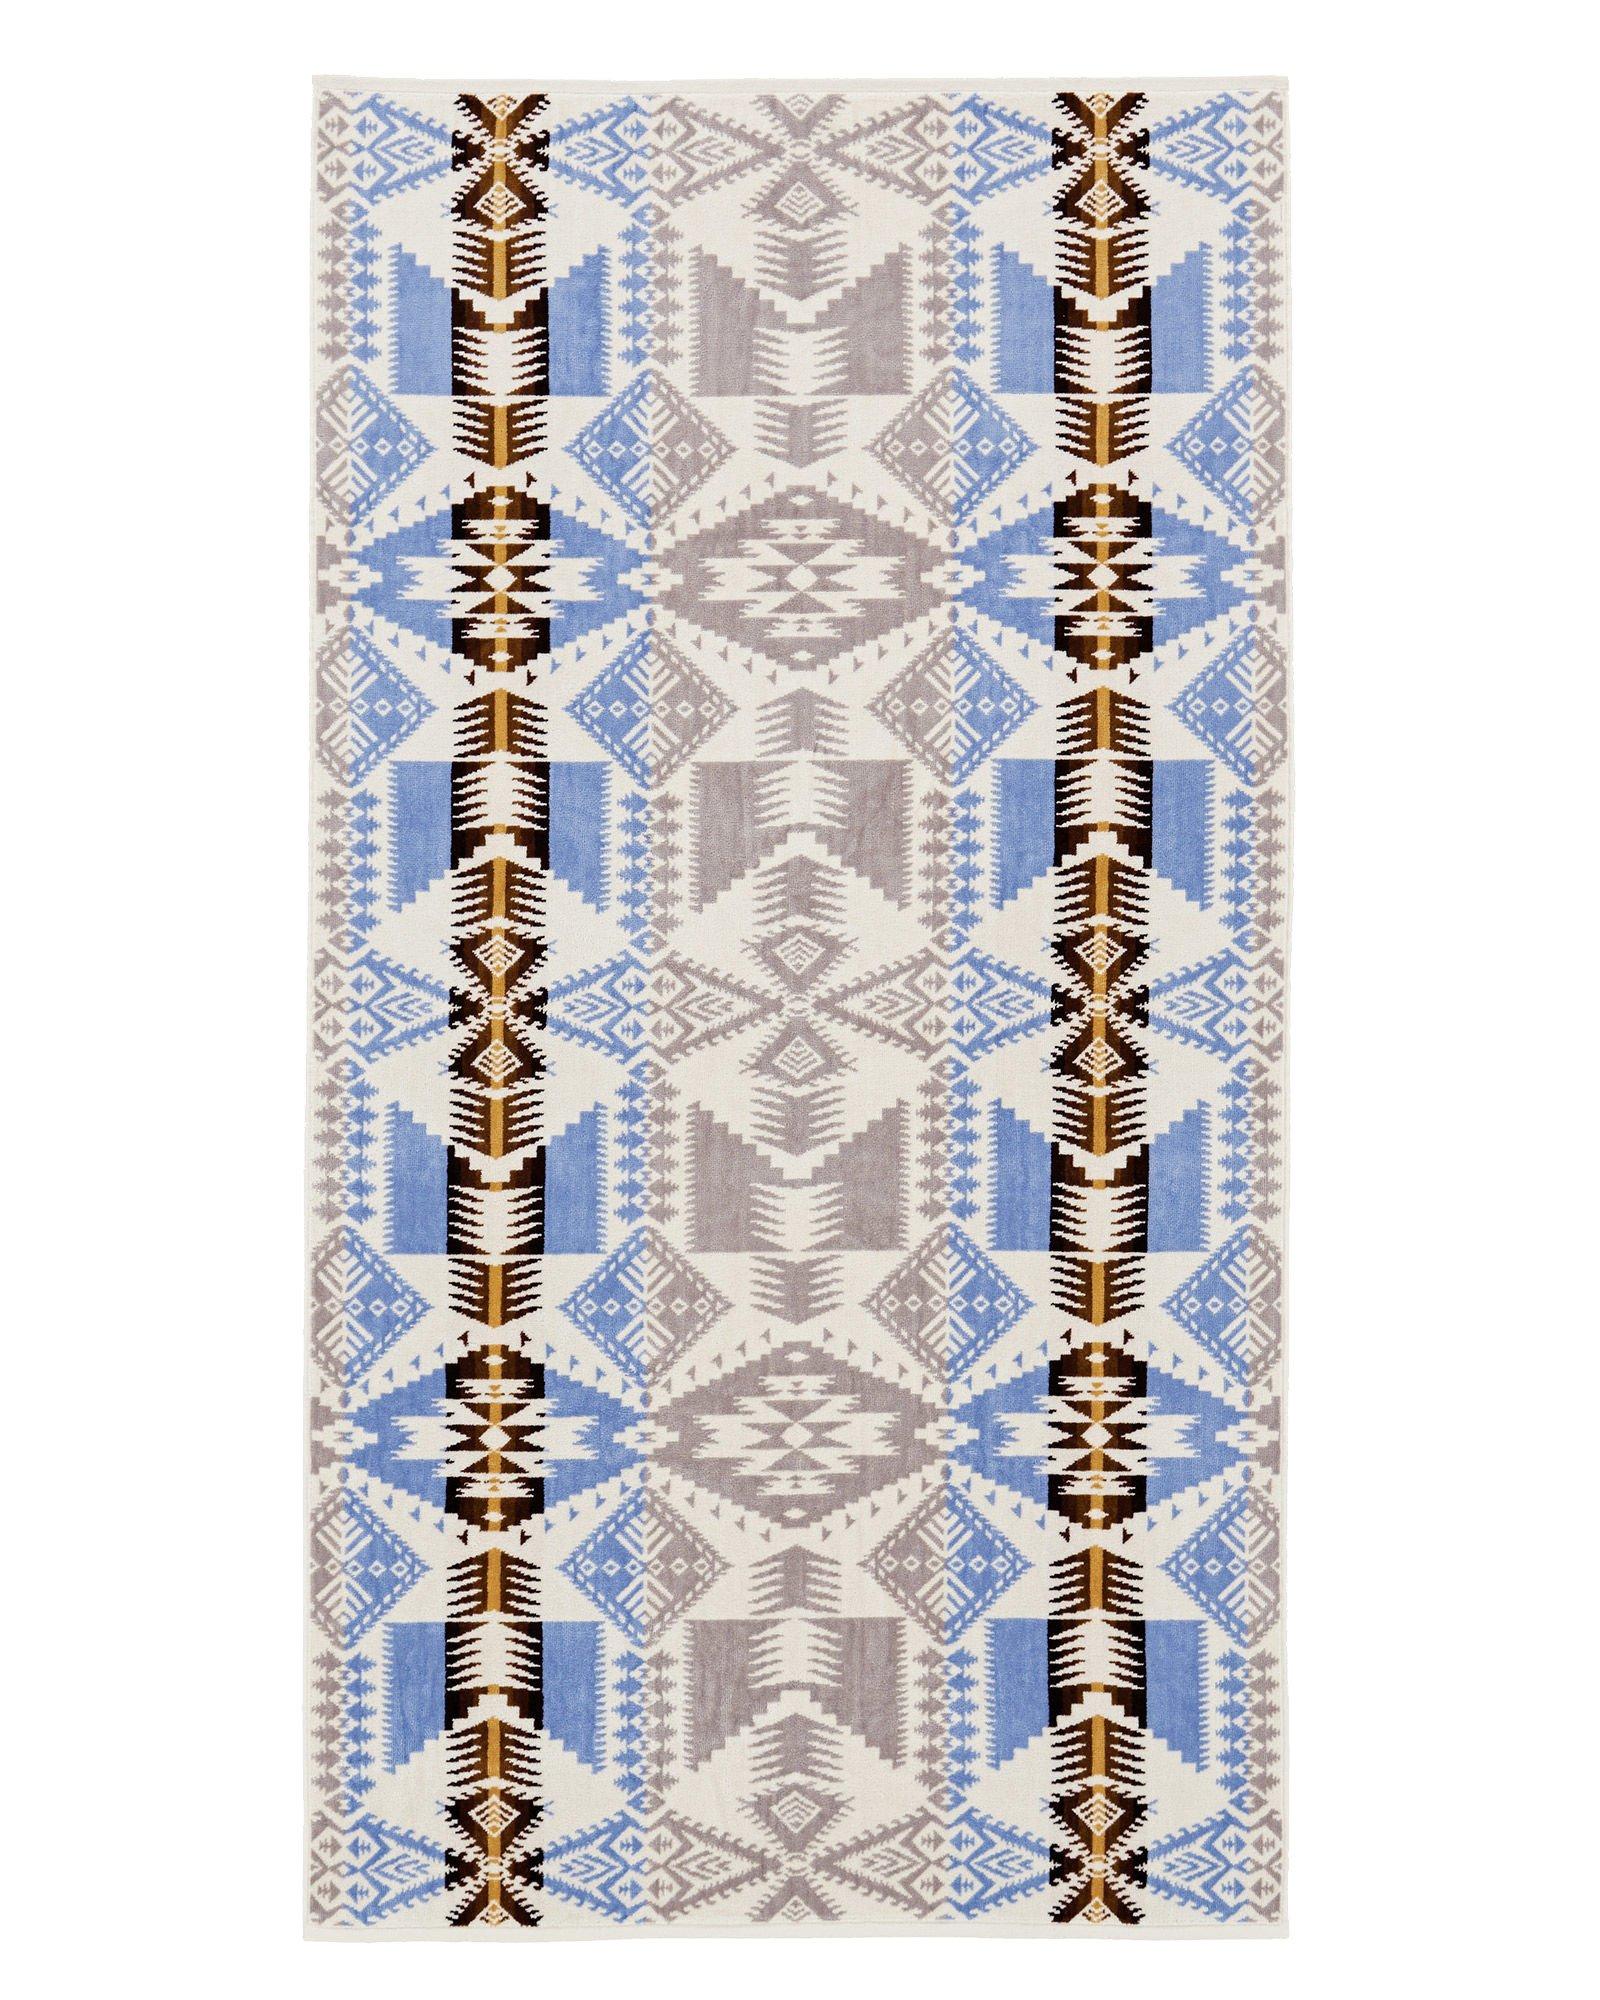 Pendleton SoftAbsorbent Cotton Bath Towel - Silver Bark Decorative Tapestry Pattern Print, One Size